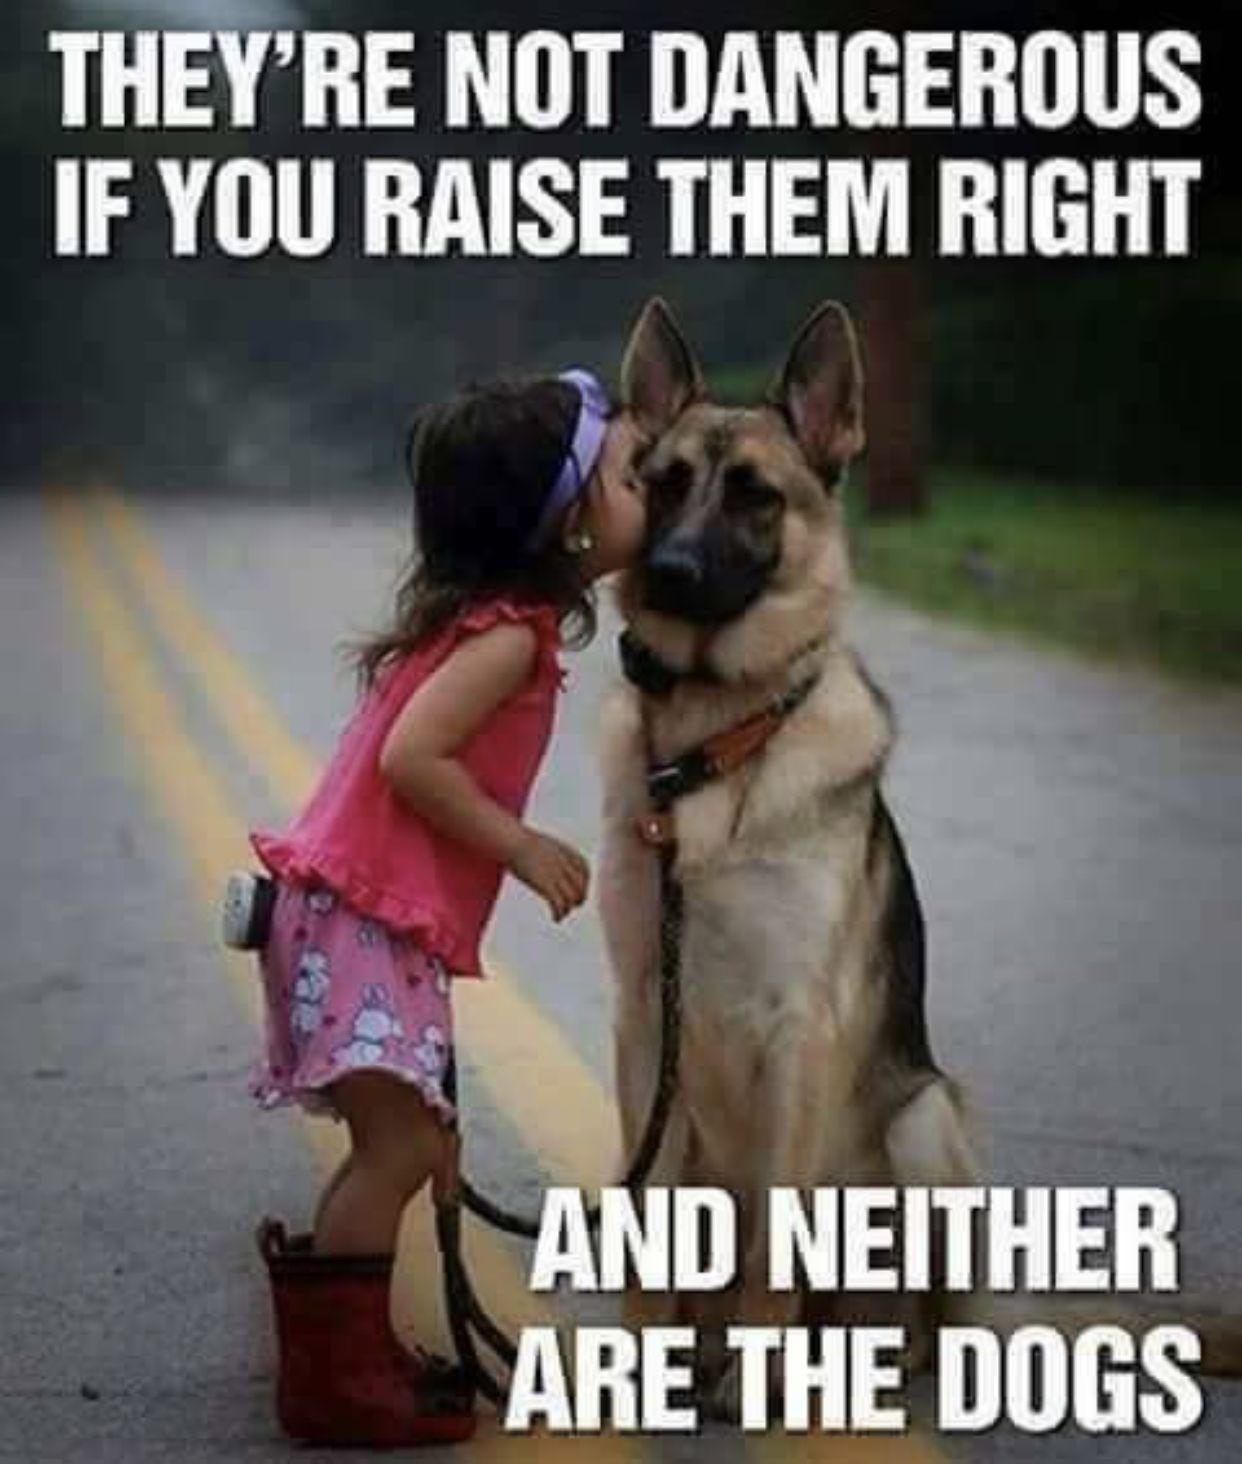 Pin by My4tress on Parenthood German shepherd dogs